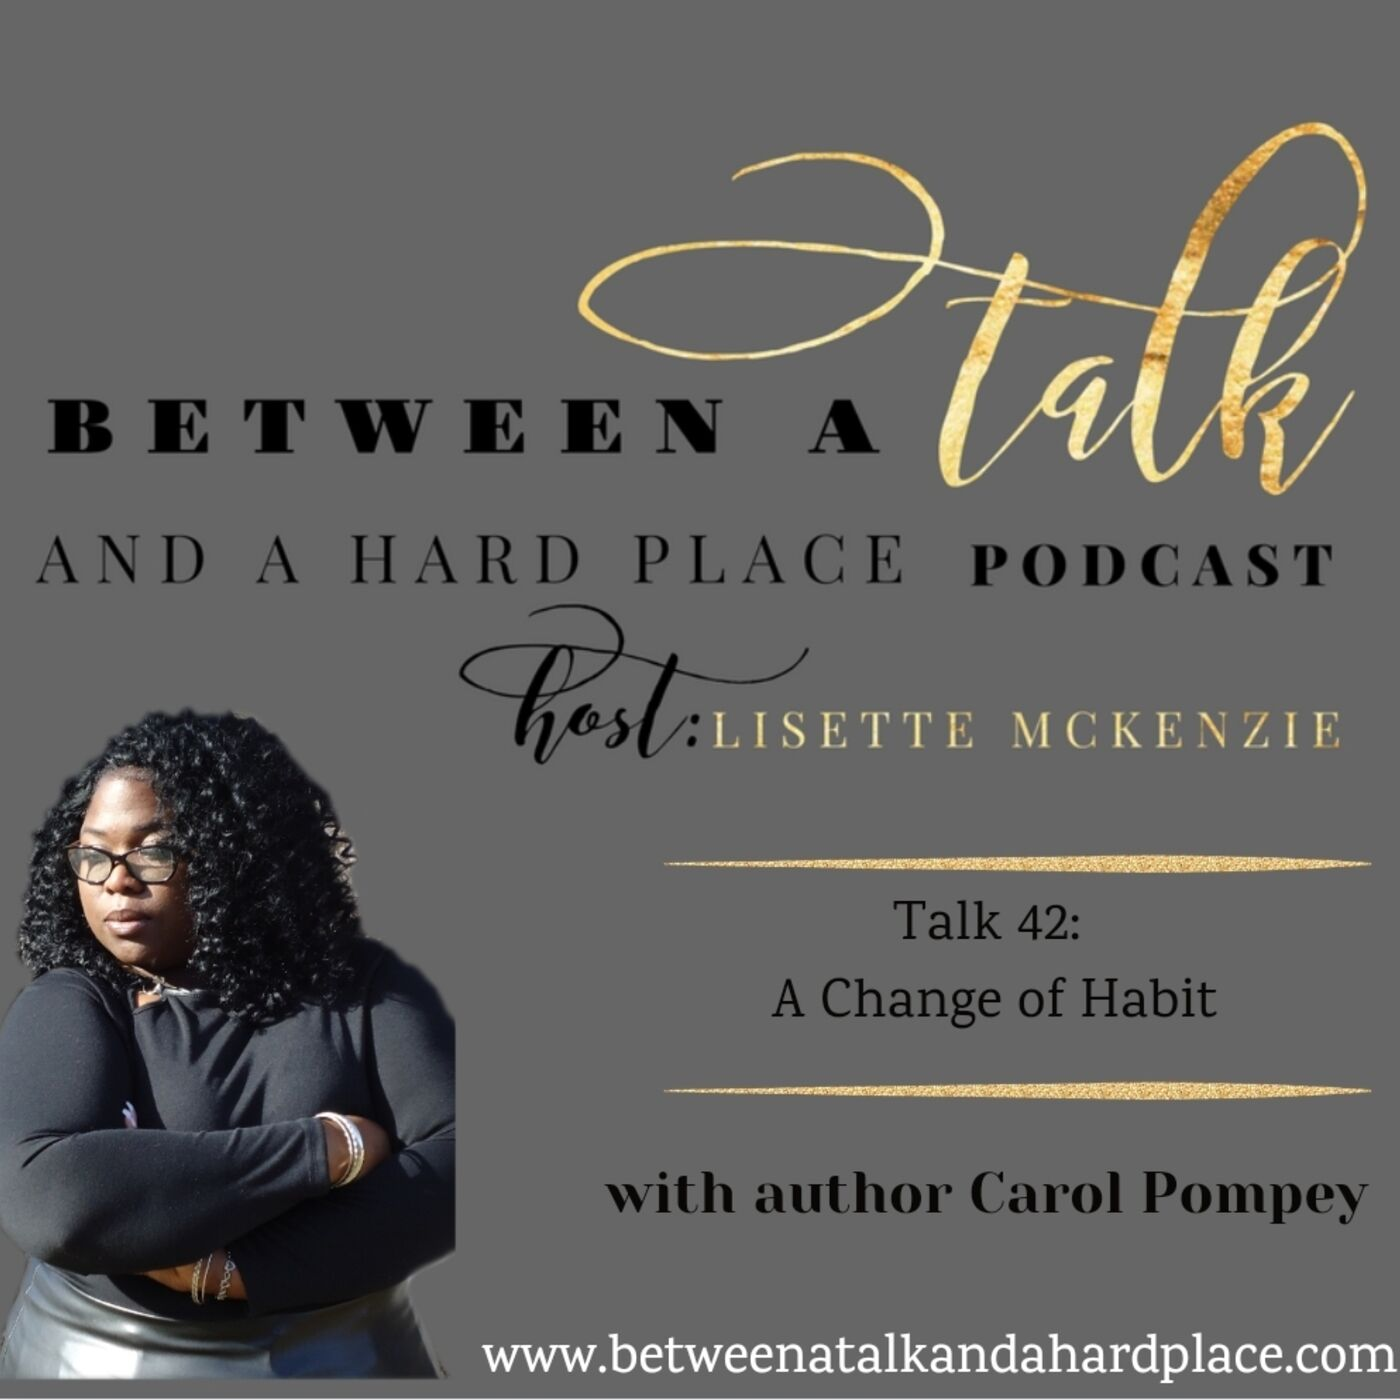 Talk 42: Change of Habit Author Carol Pompey